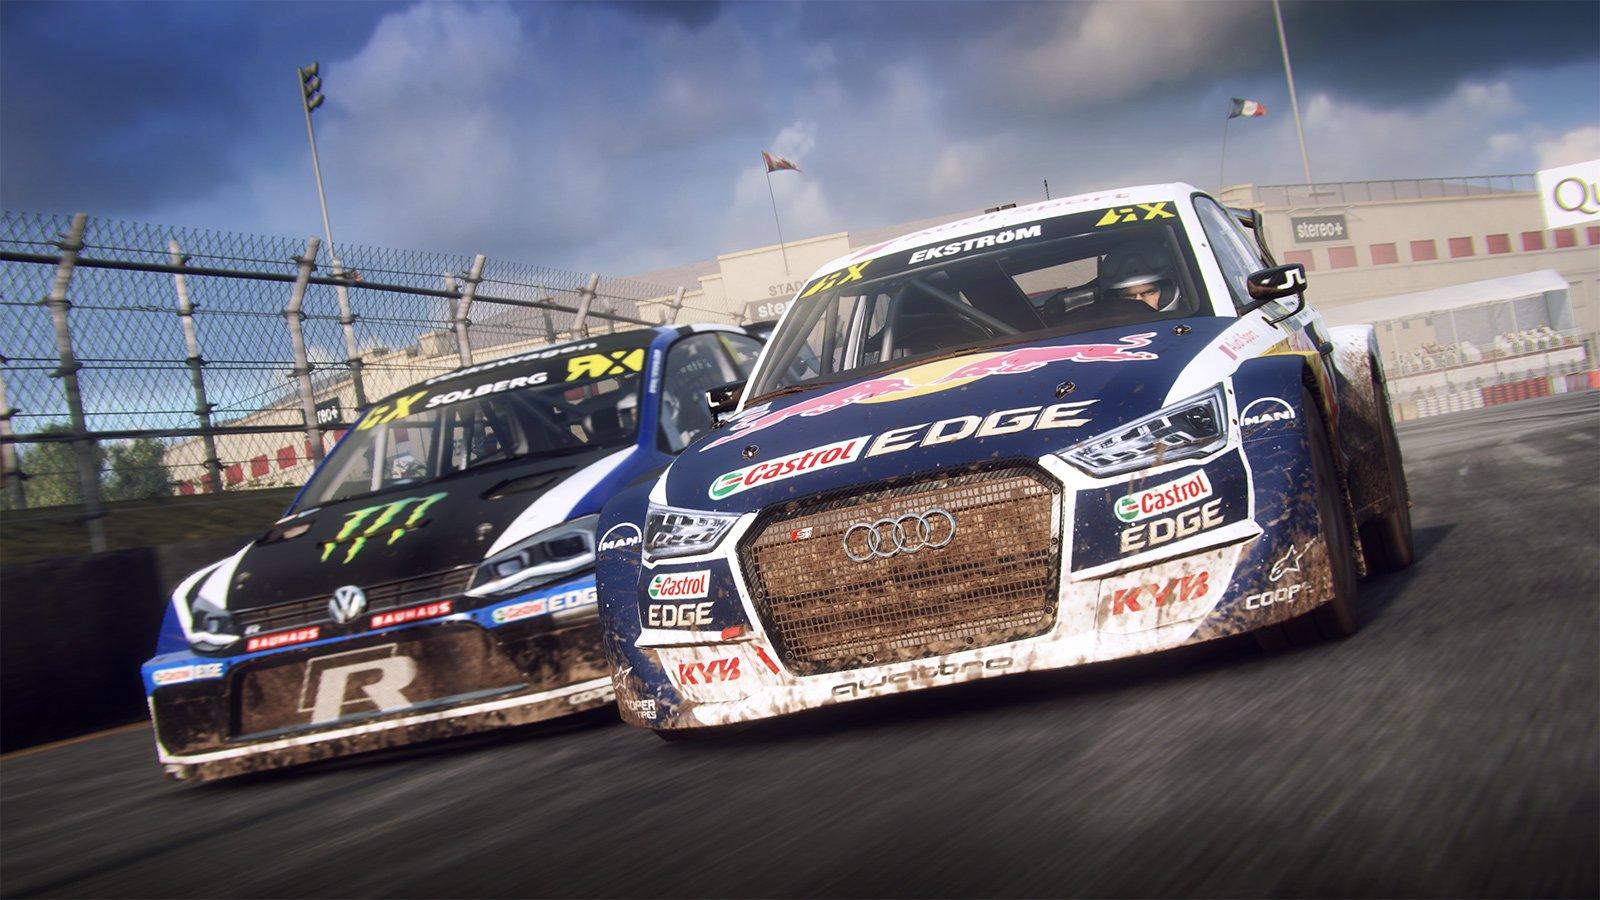 Codemasters anuncia DiRT Rally 2.0